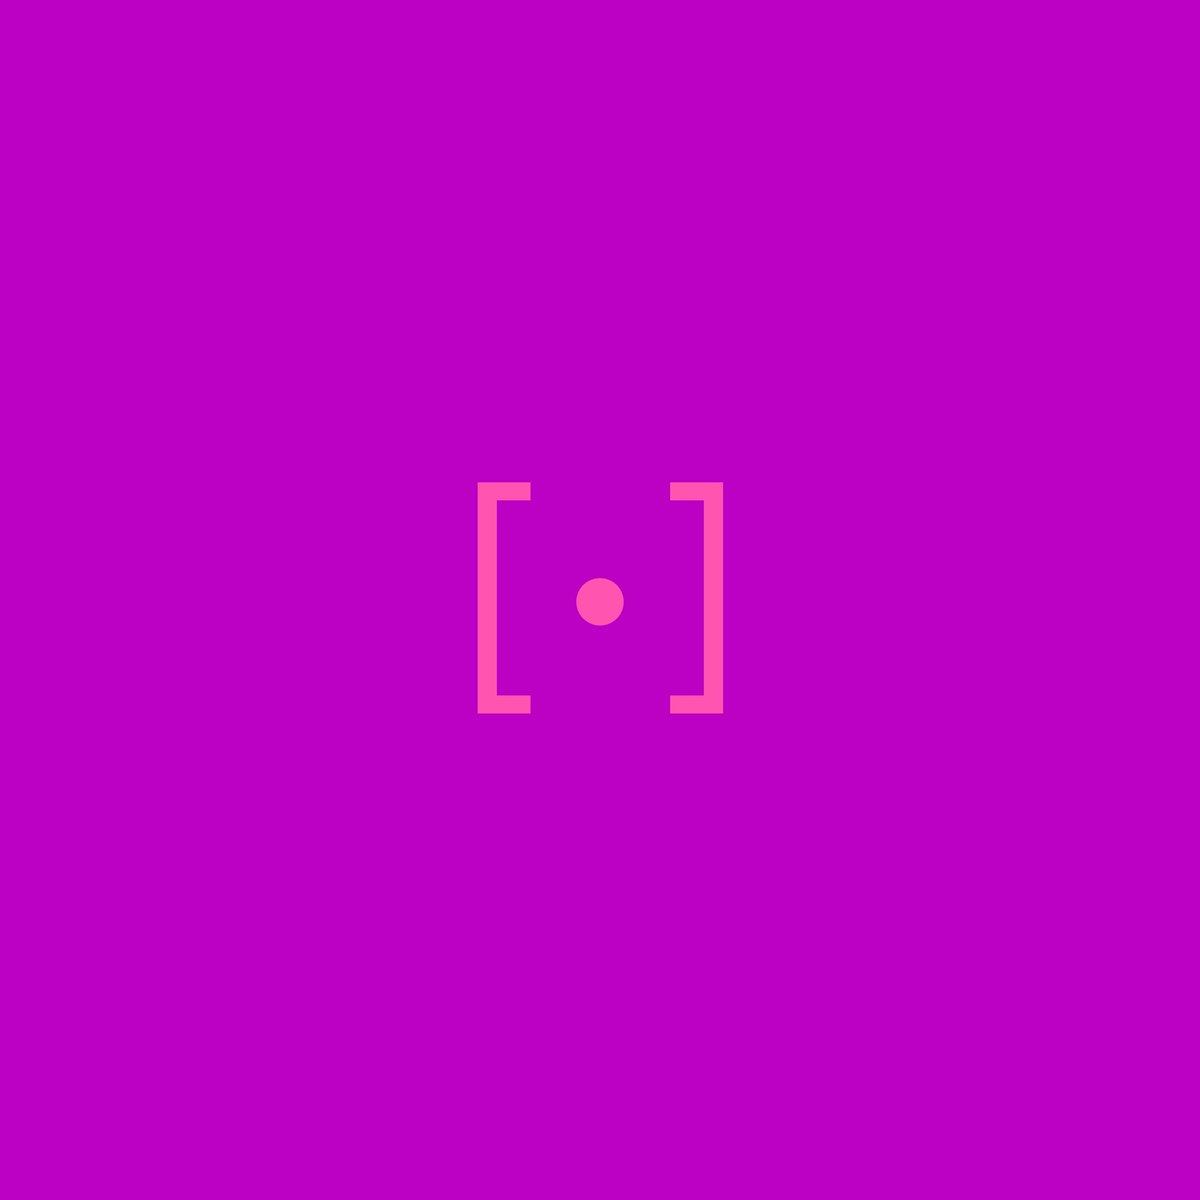 download the jerusalem talmud תלמוד ירושׁלמי third order našim סדר נשׁים tractate yebamot מסכת יבמות edition translation and commentary 2004